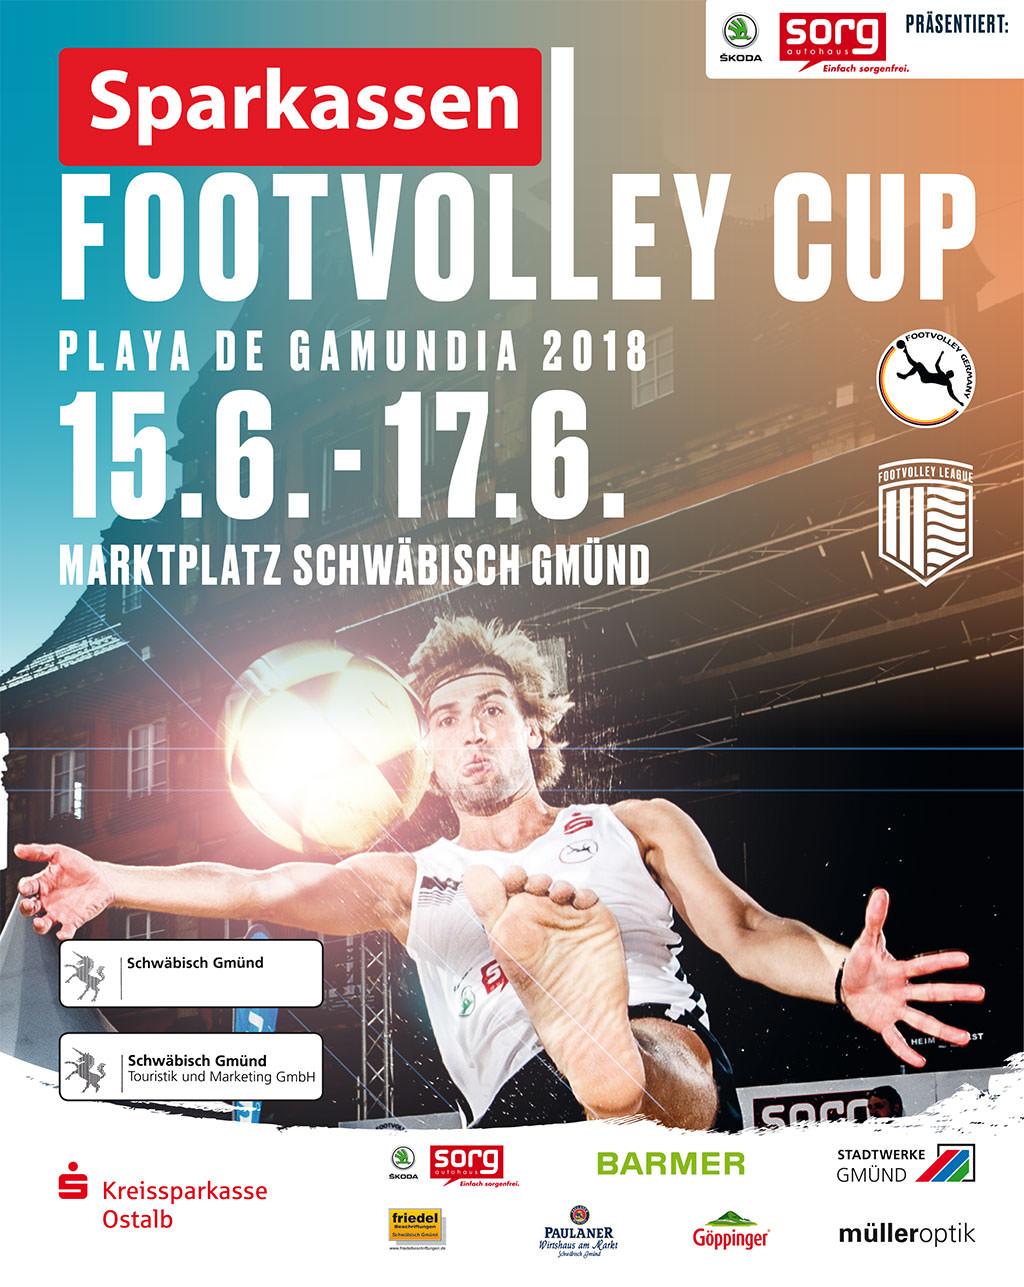 Playa de Gamundia 2018 – Sparkassen Footvolley Cup